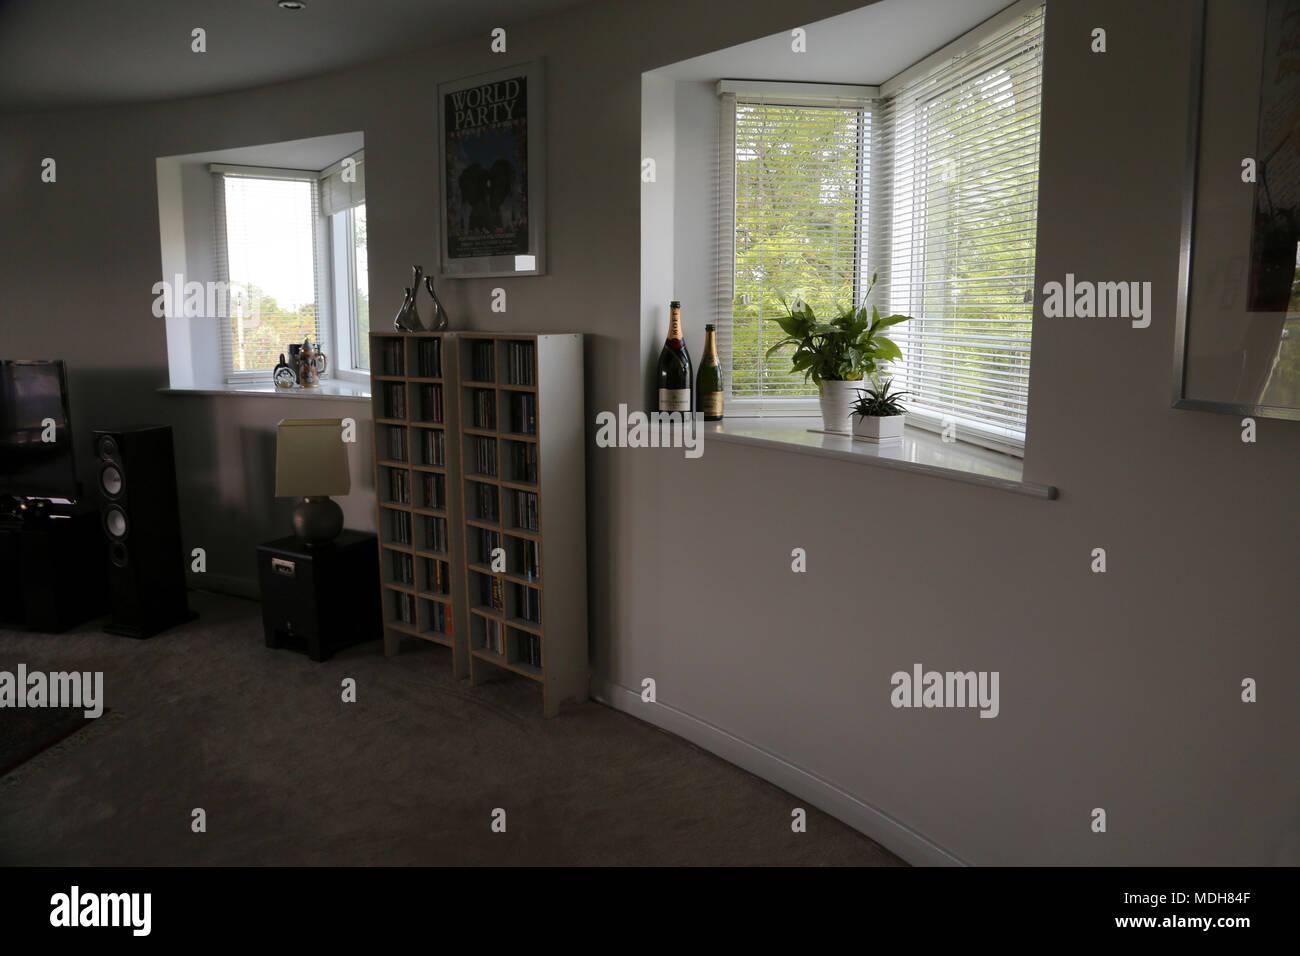 Open Plan Living Room With CD's On Shelves Cheltenham Gloucestershire England - Stock Image